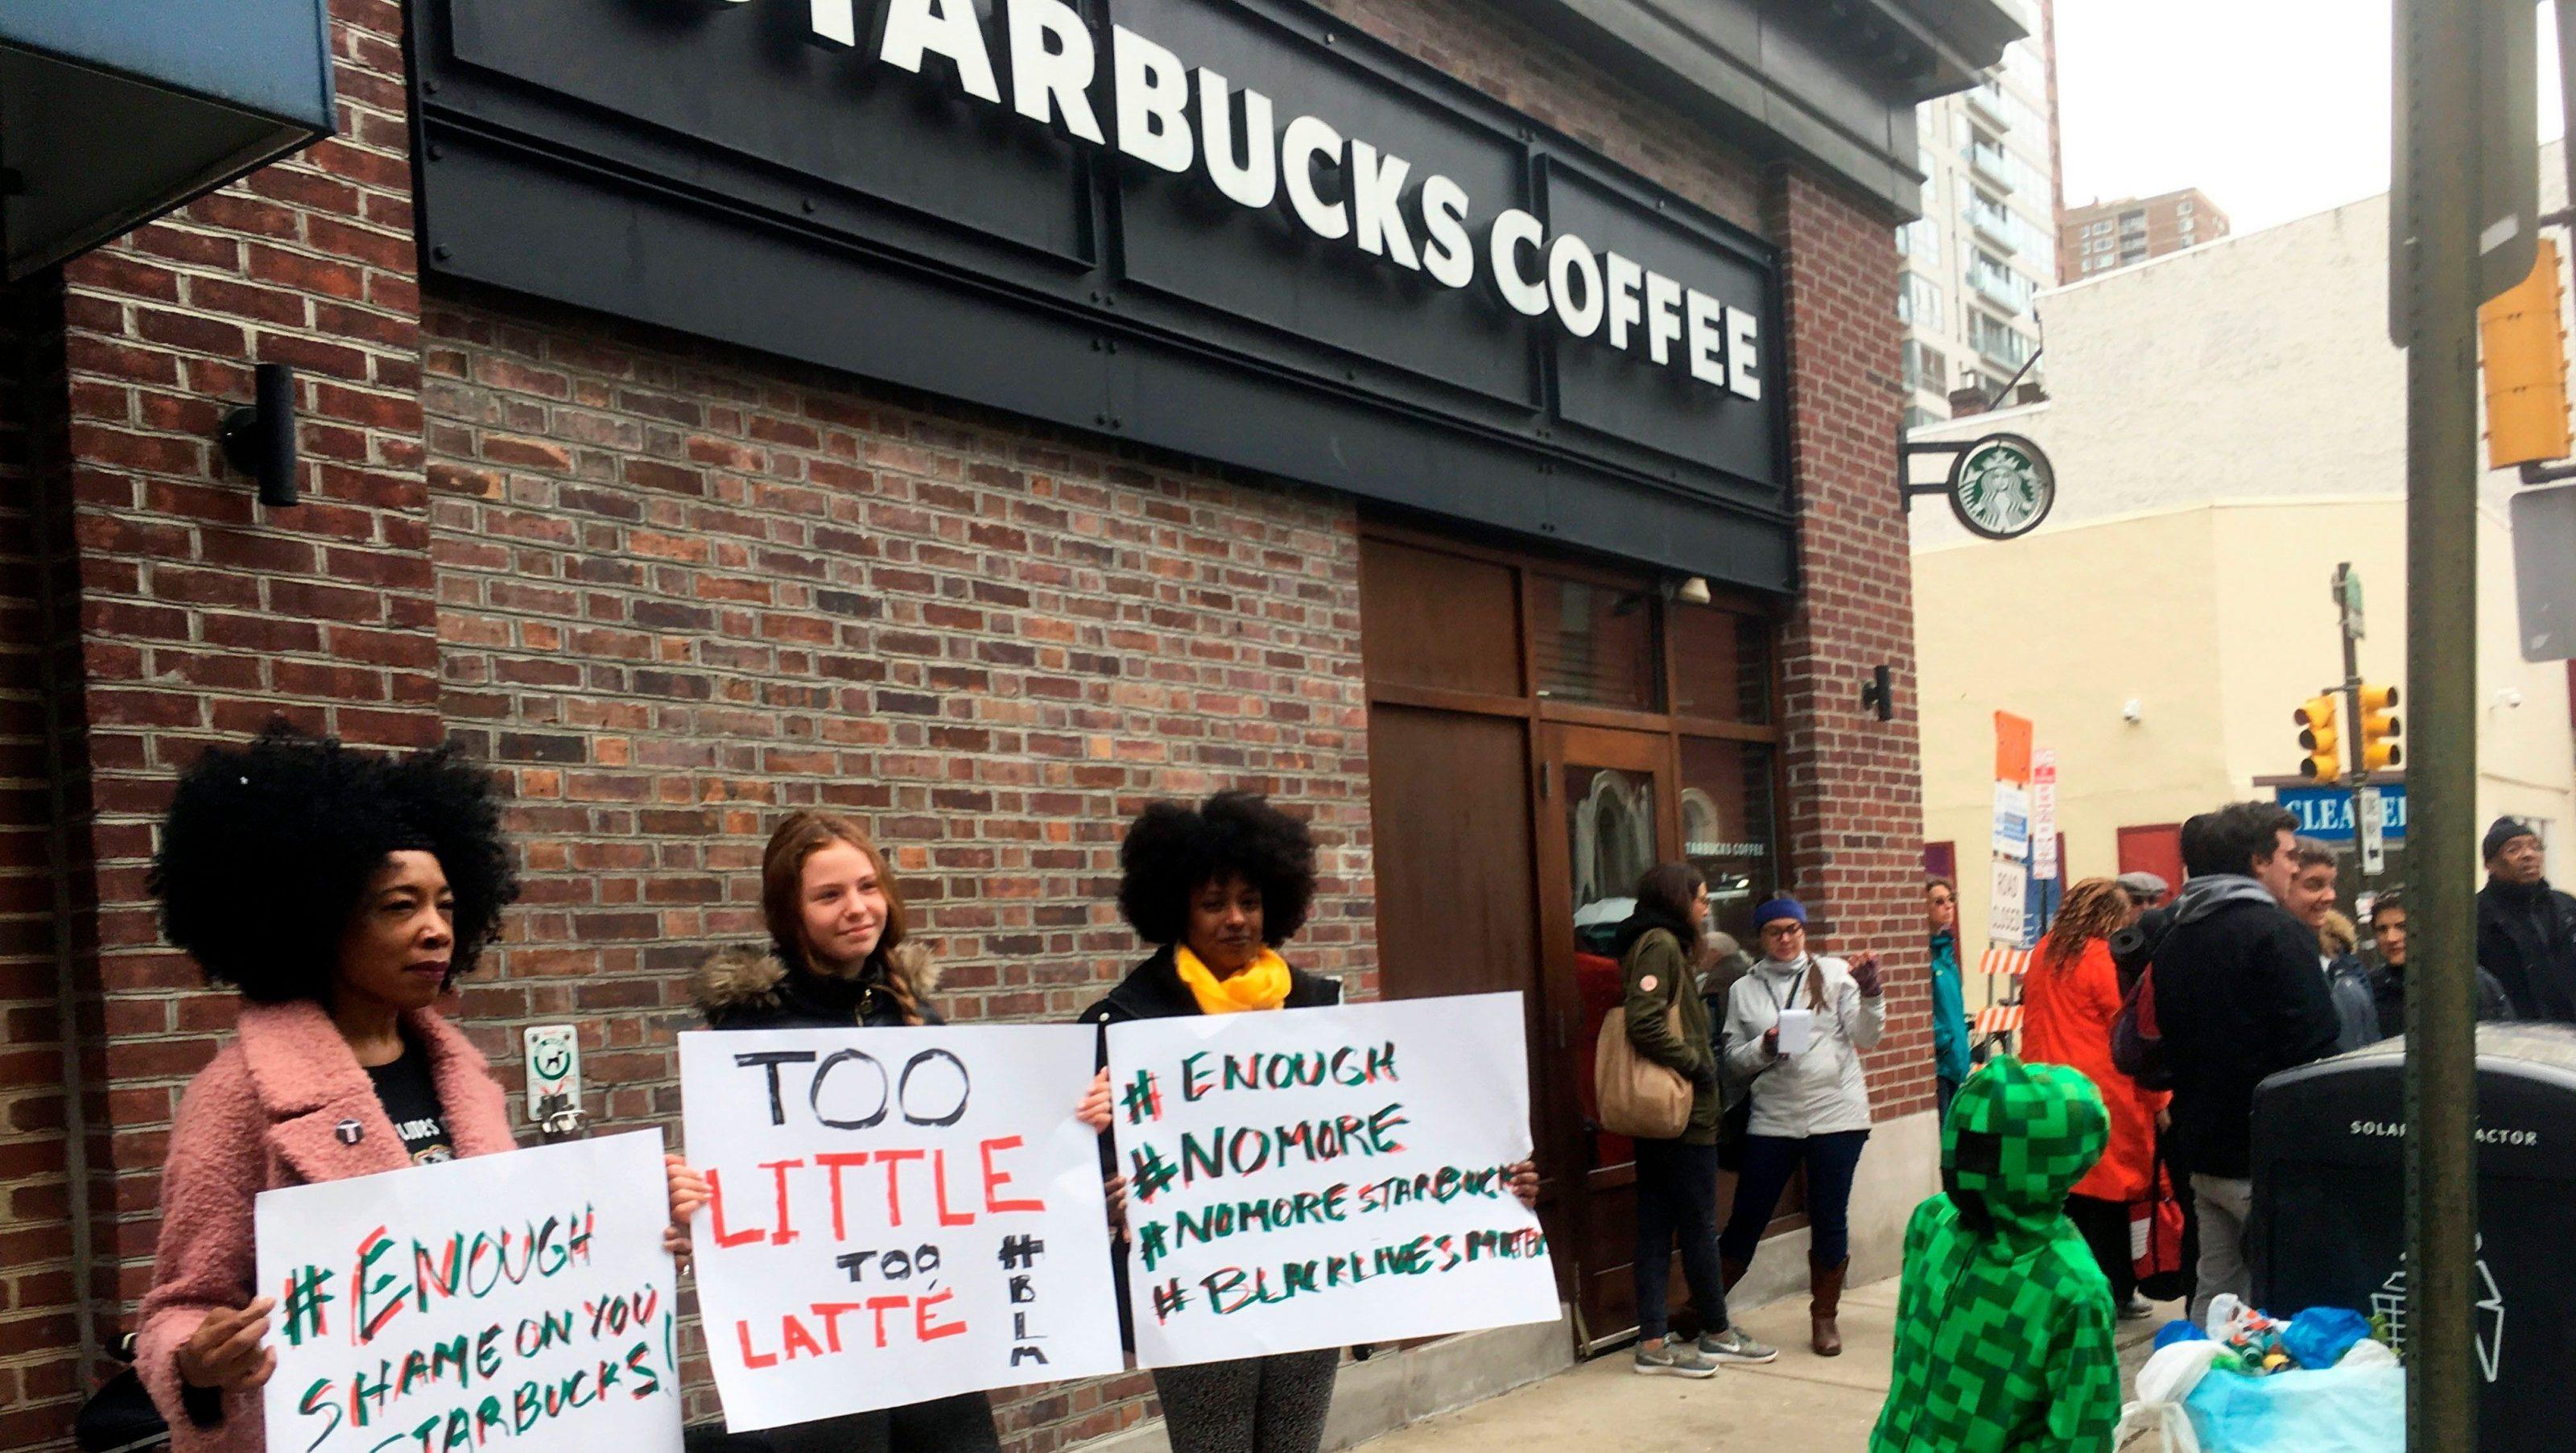 Protestors outside the Philadelphia Starbucks April 15.